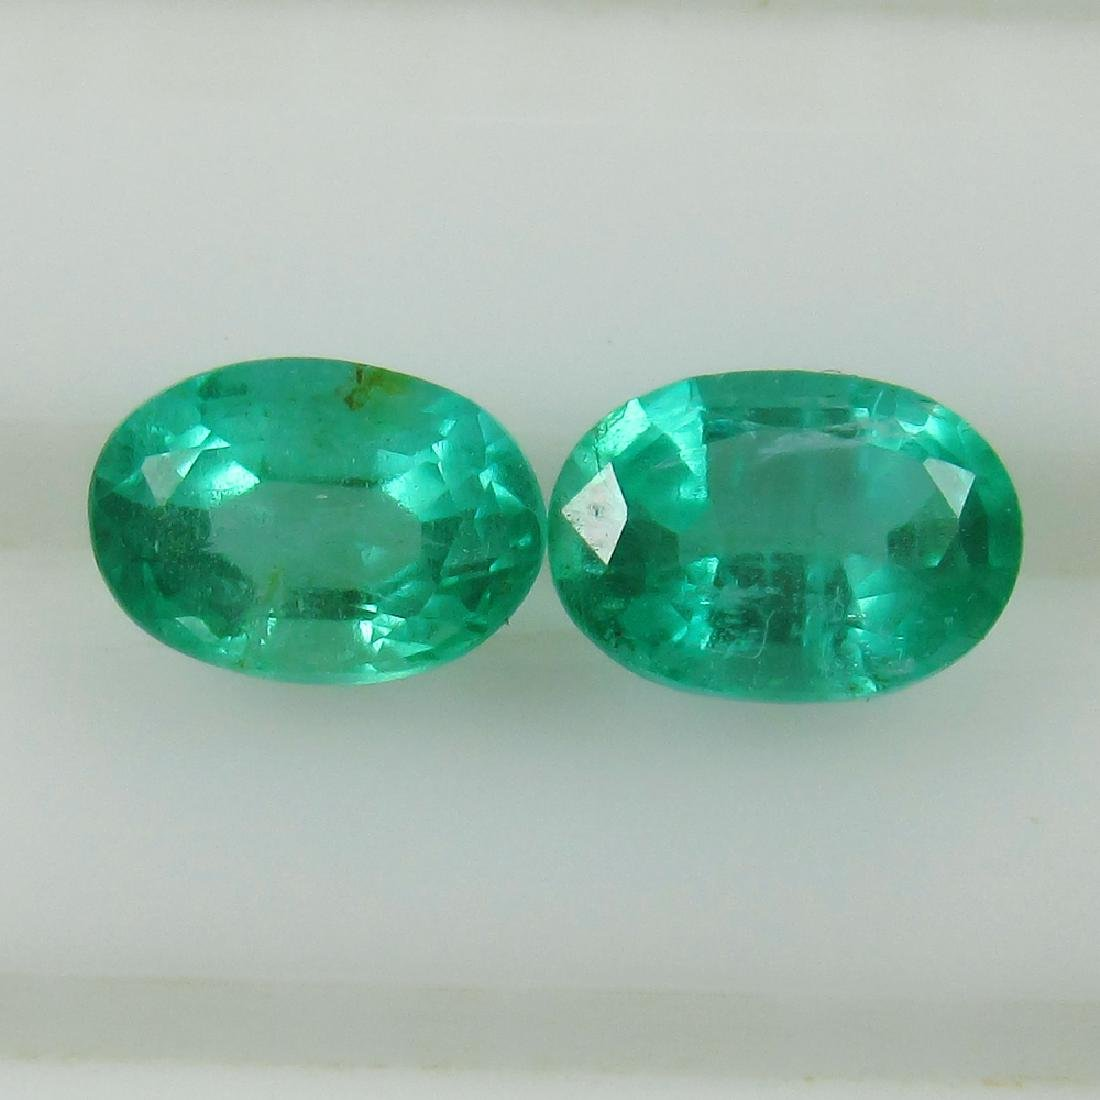 0.97 Ct Genuine Zambian Emerald Matching Oval Pair